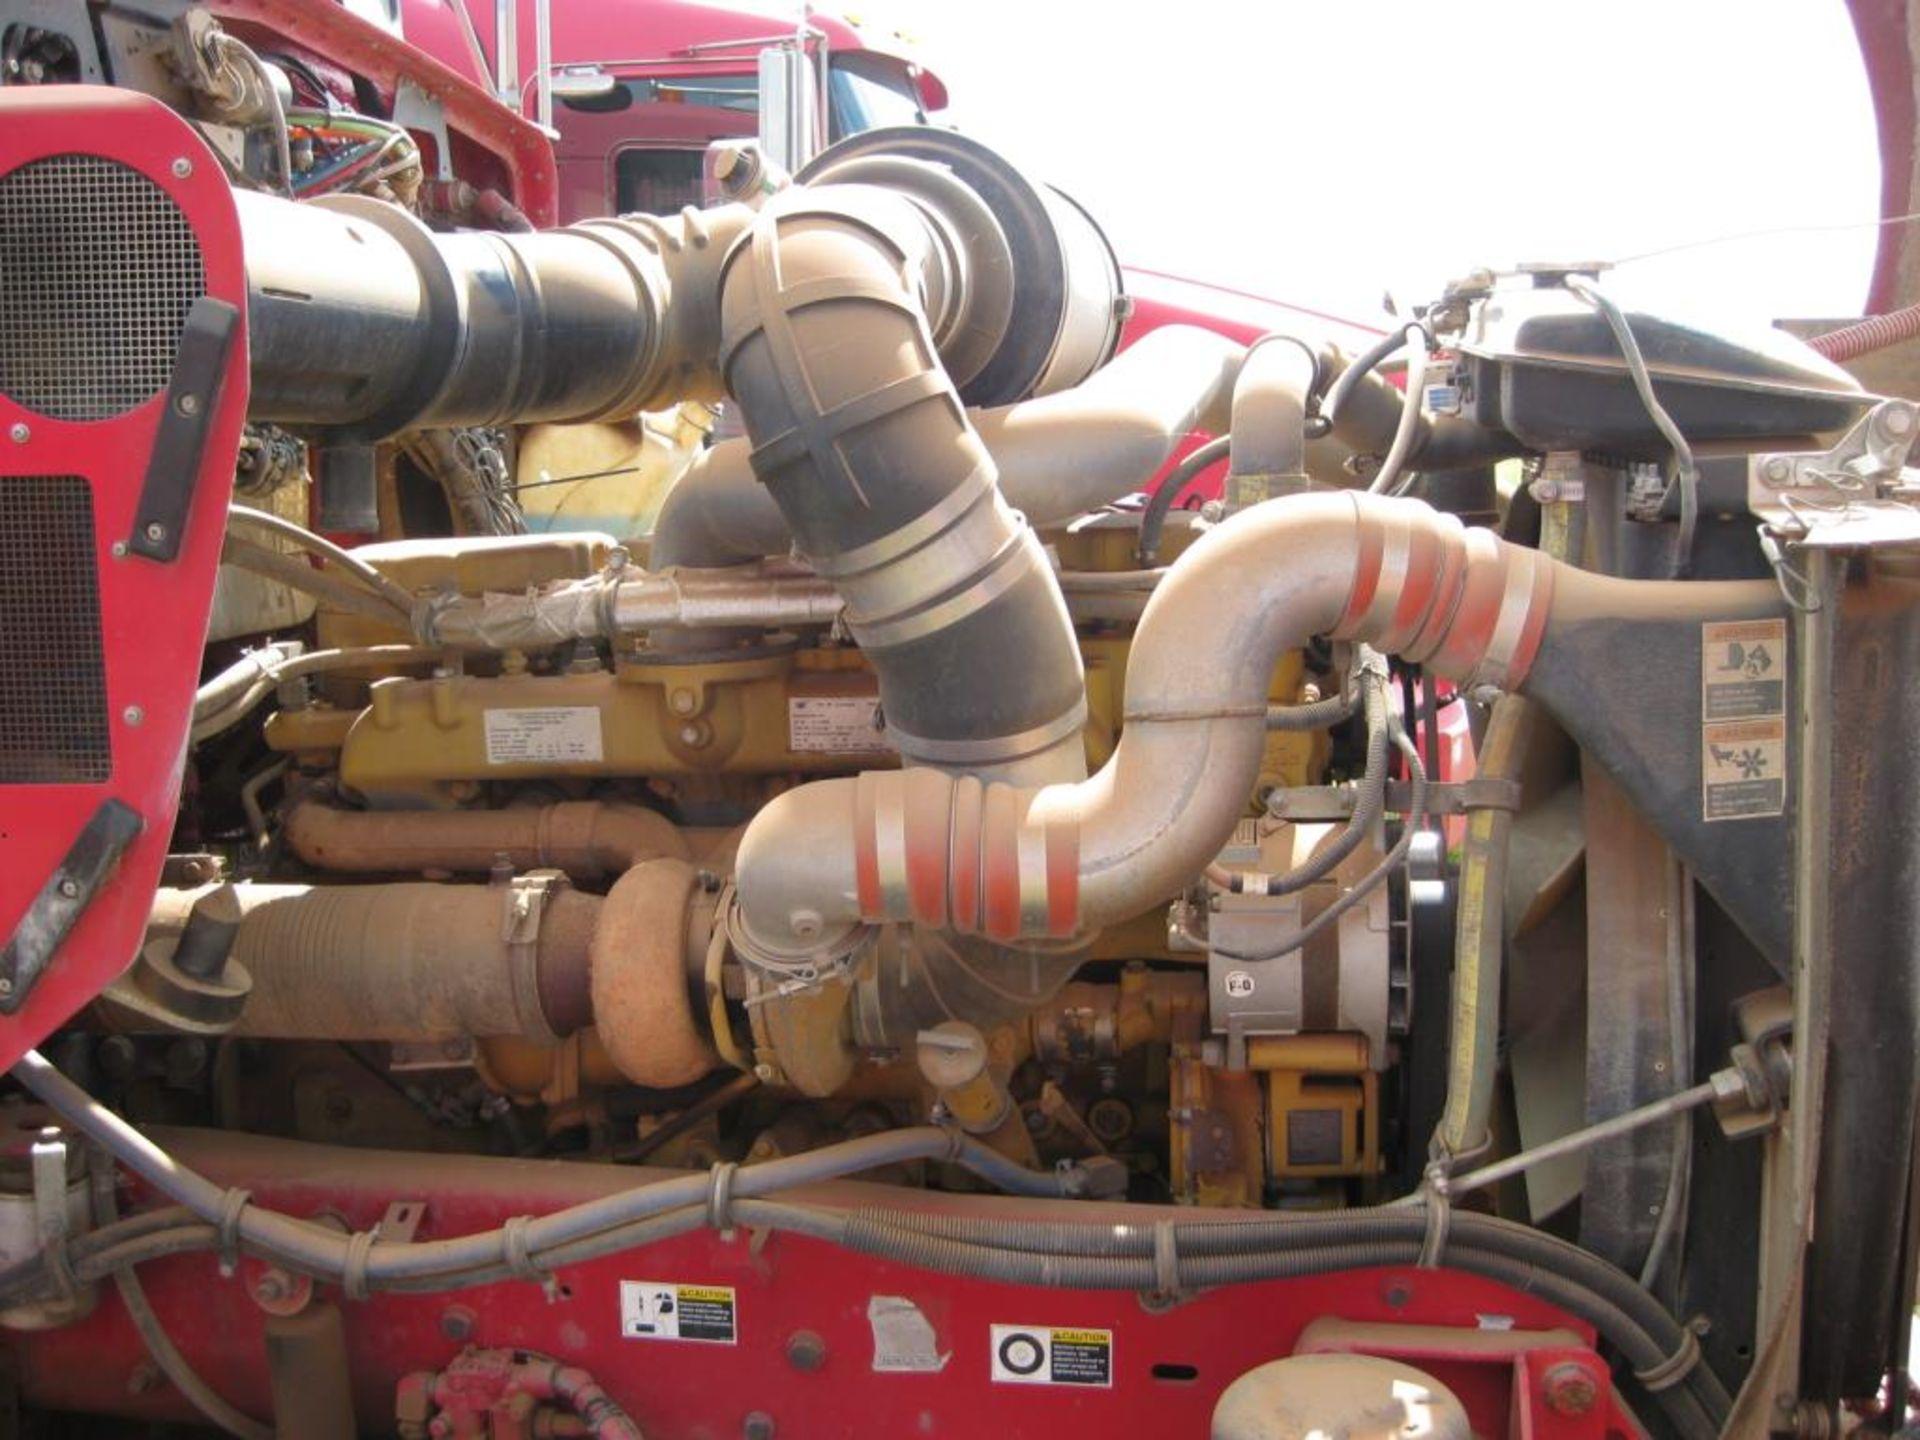 Kenworth Winch Truck - Image 23 of 23